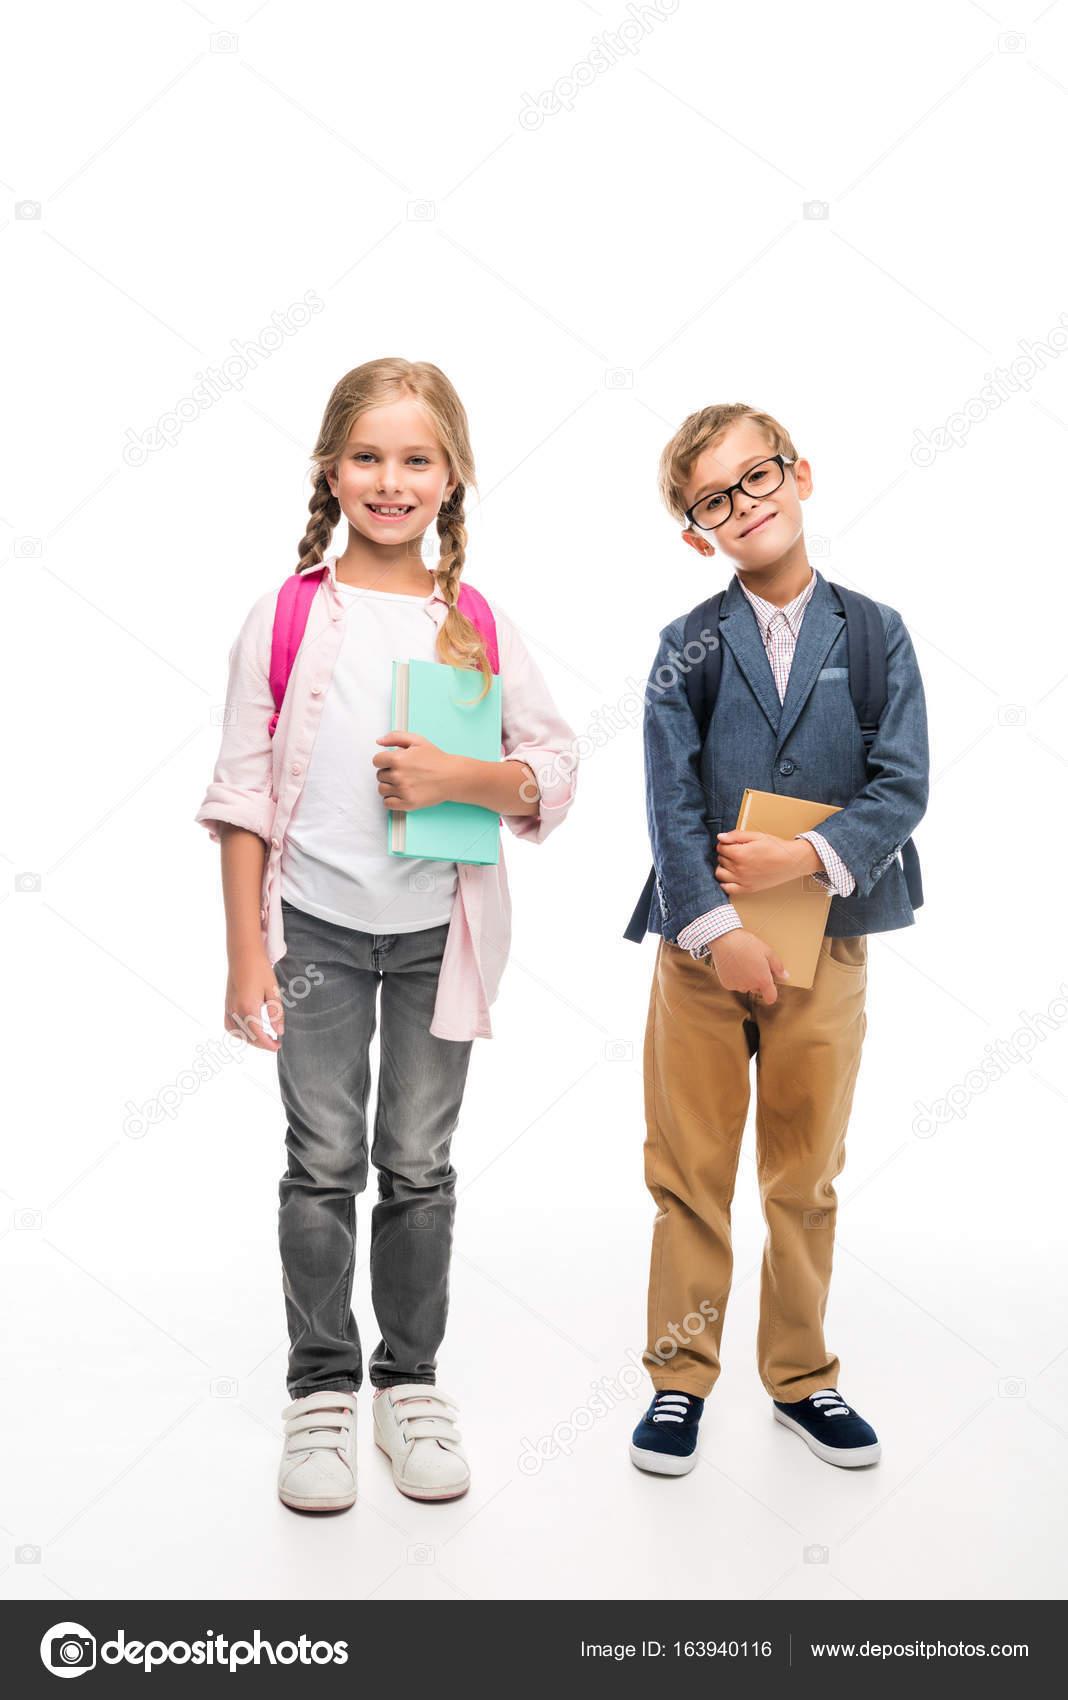 classmates with backpacks and books stock photo allaserebrina